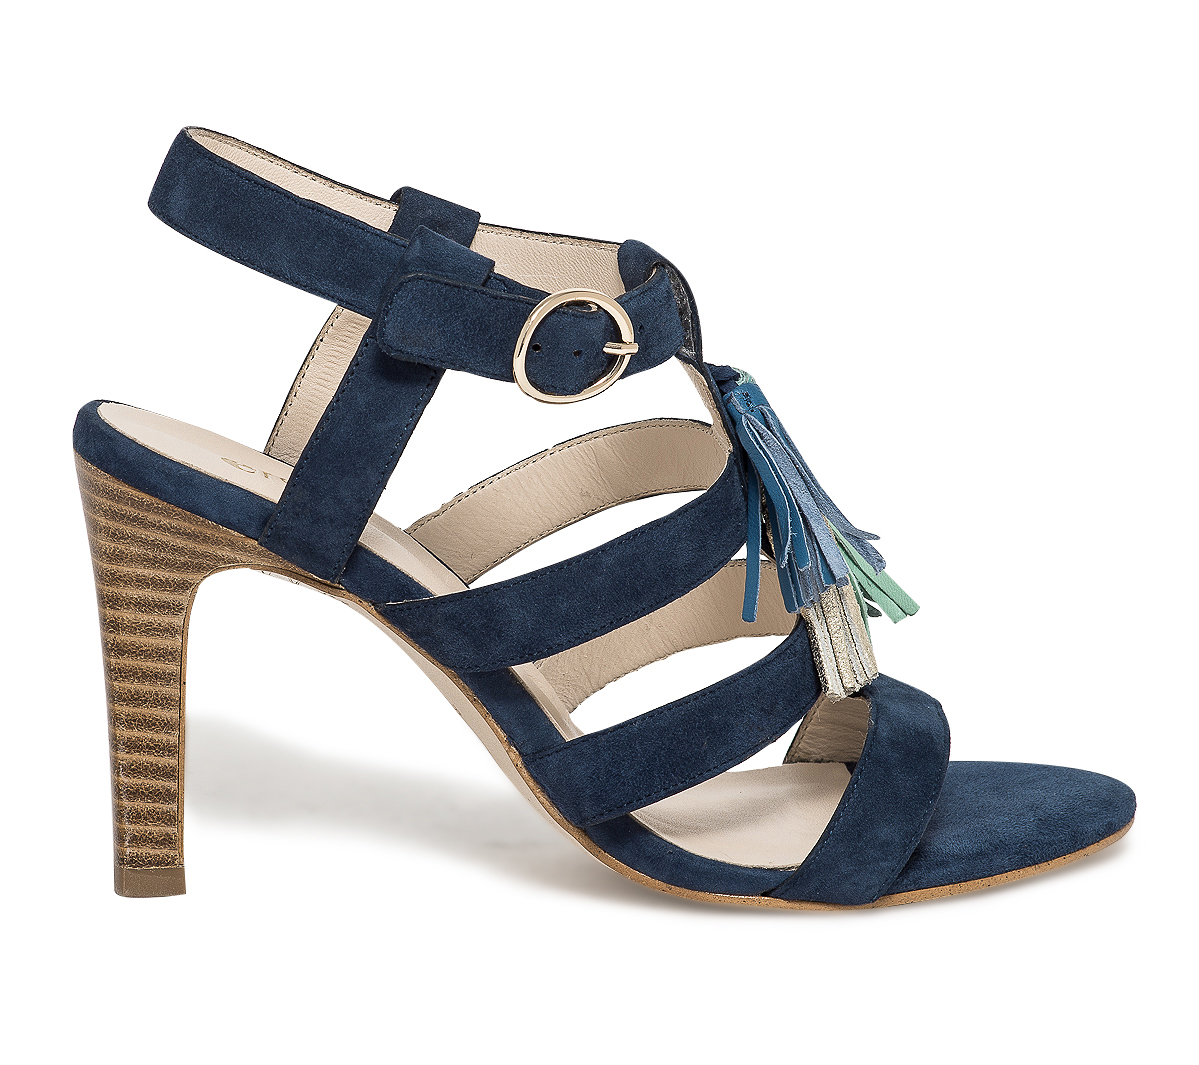 À Bleue Multibride Pompons Sandale Eram Tl5uKJF31c